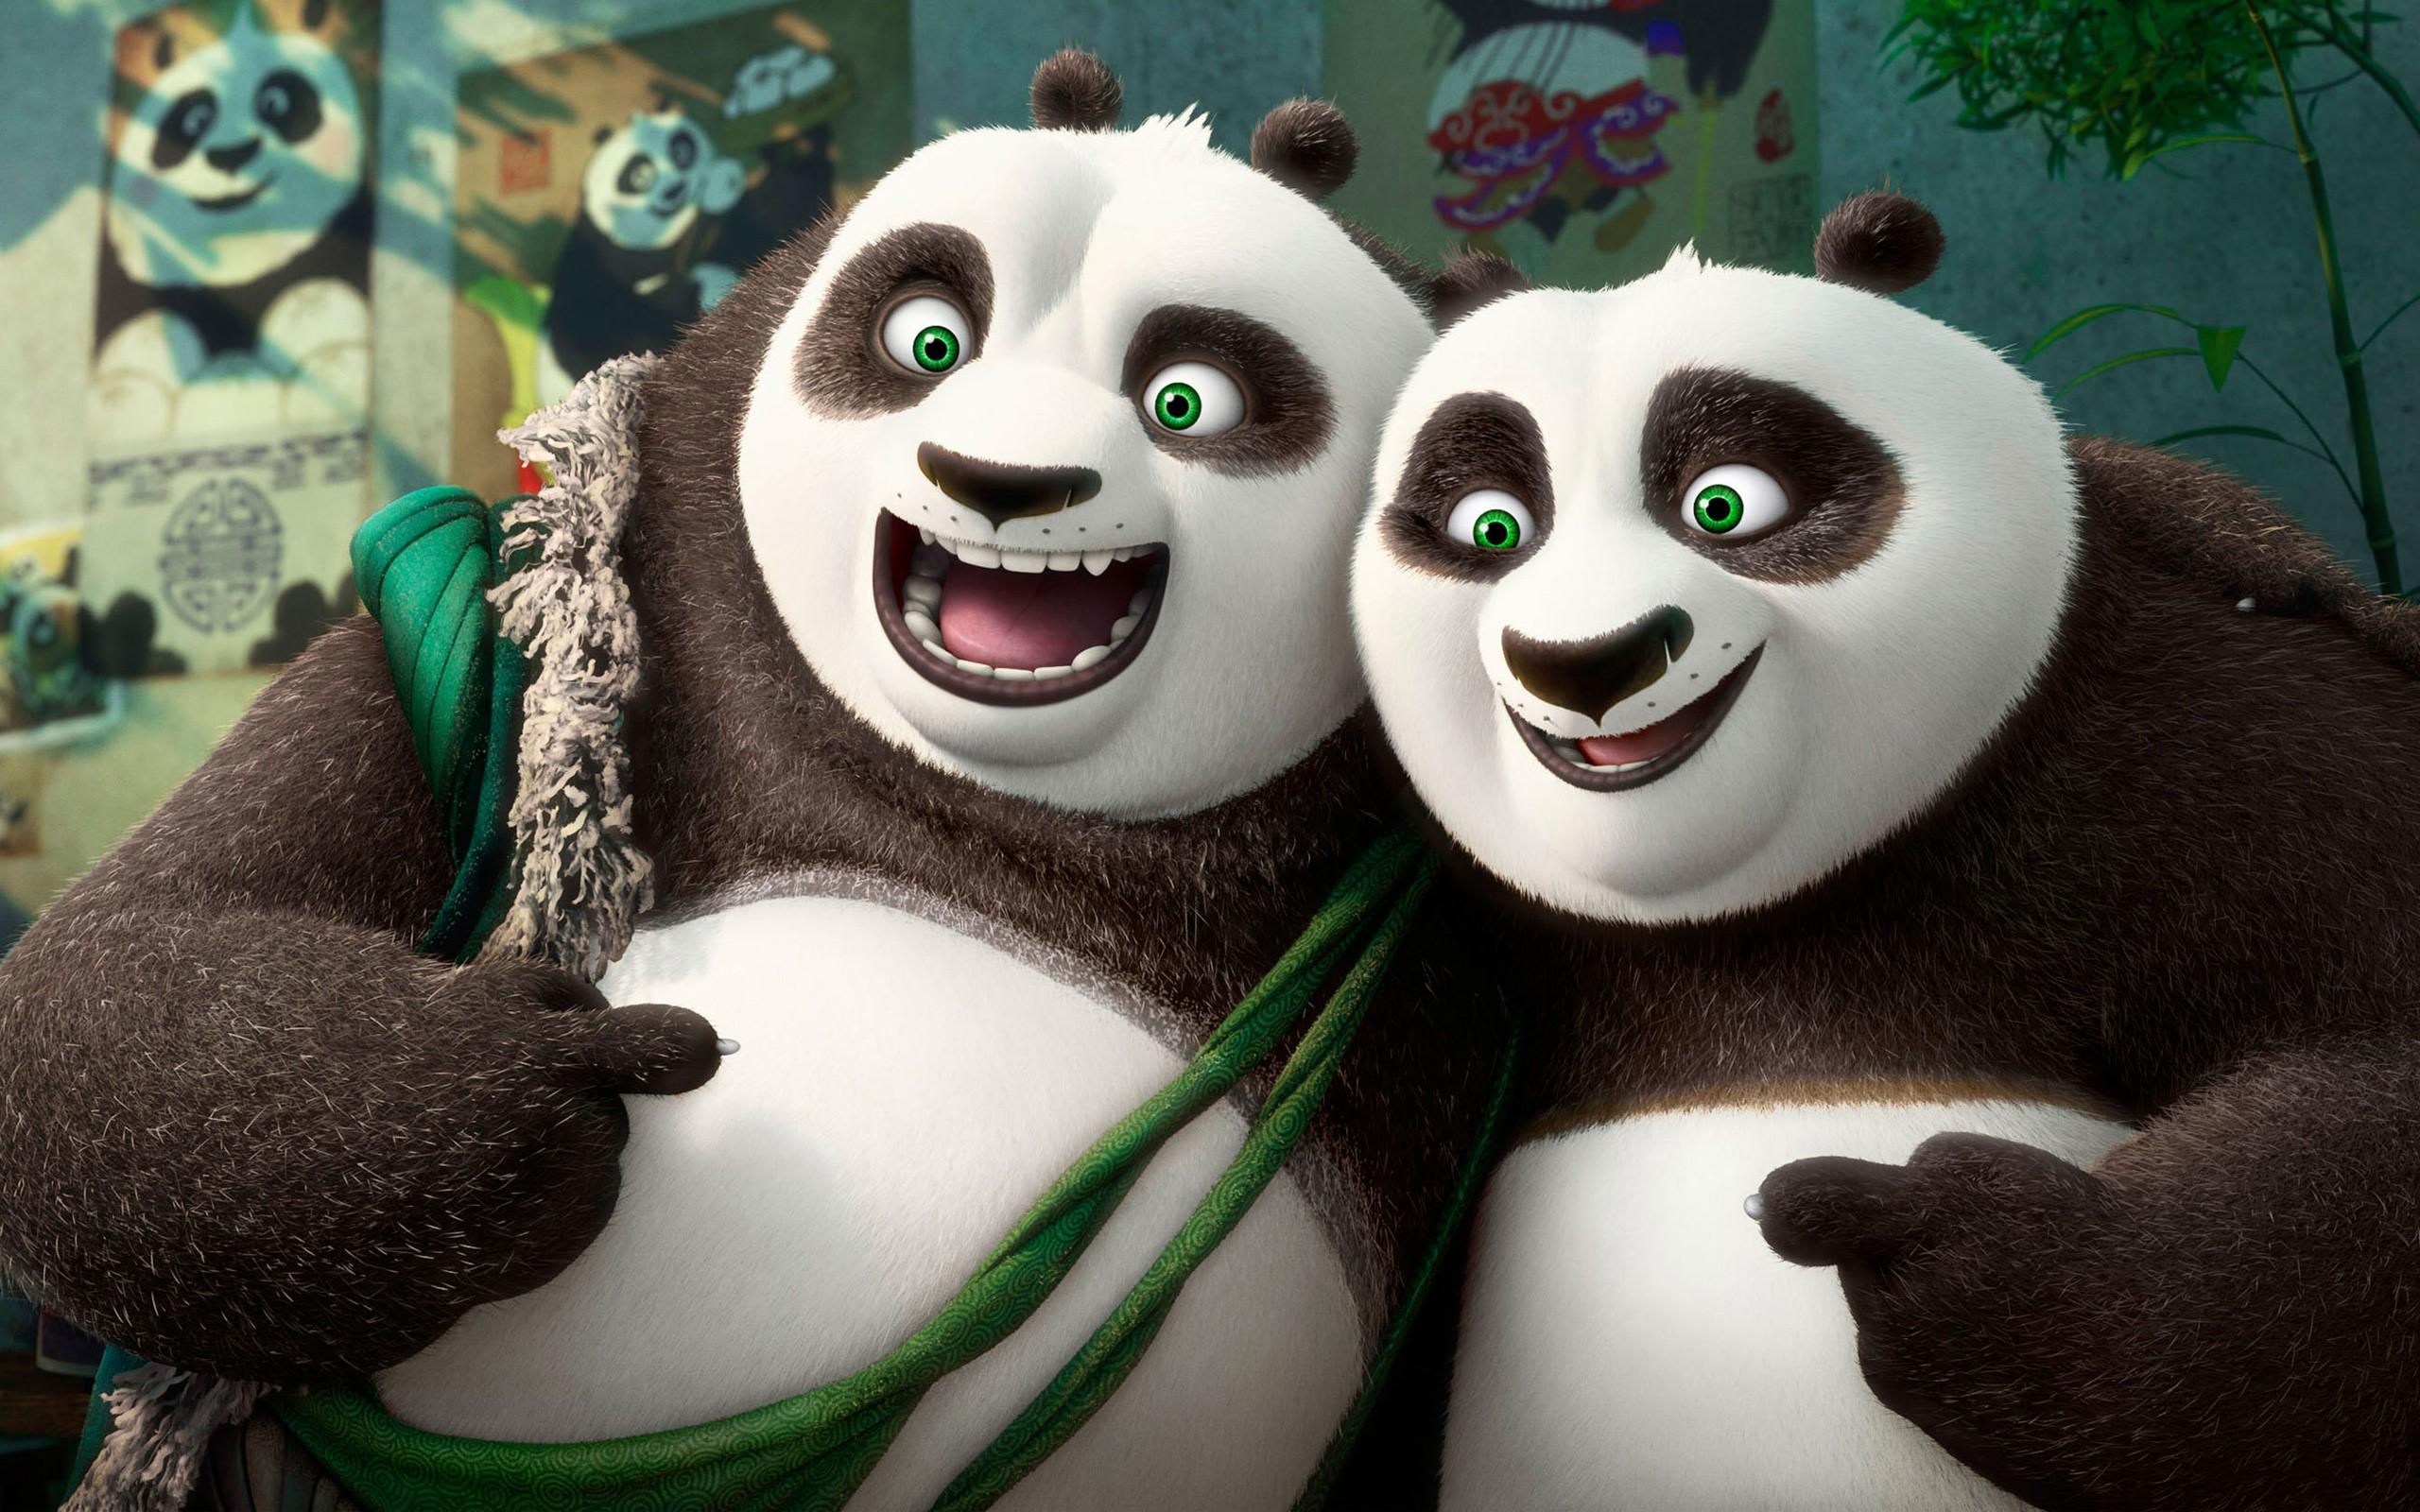 2048x1152 po li kung fu panda 3 2048x1152 resolution hd 4k - Kung fu panda wallpaper ...